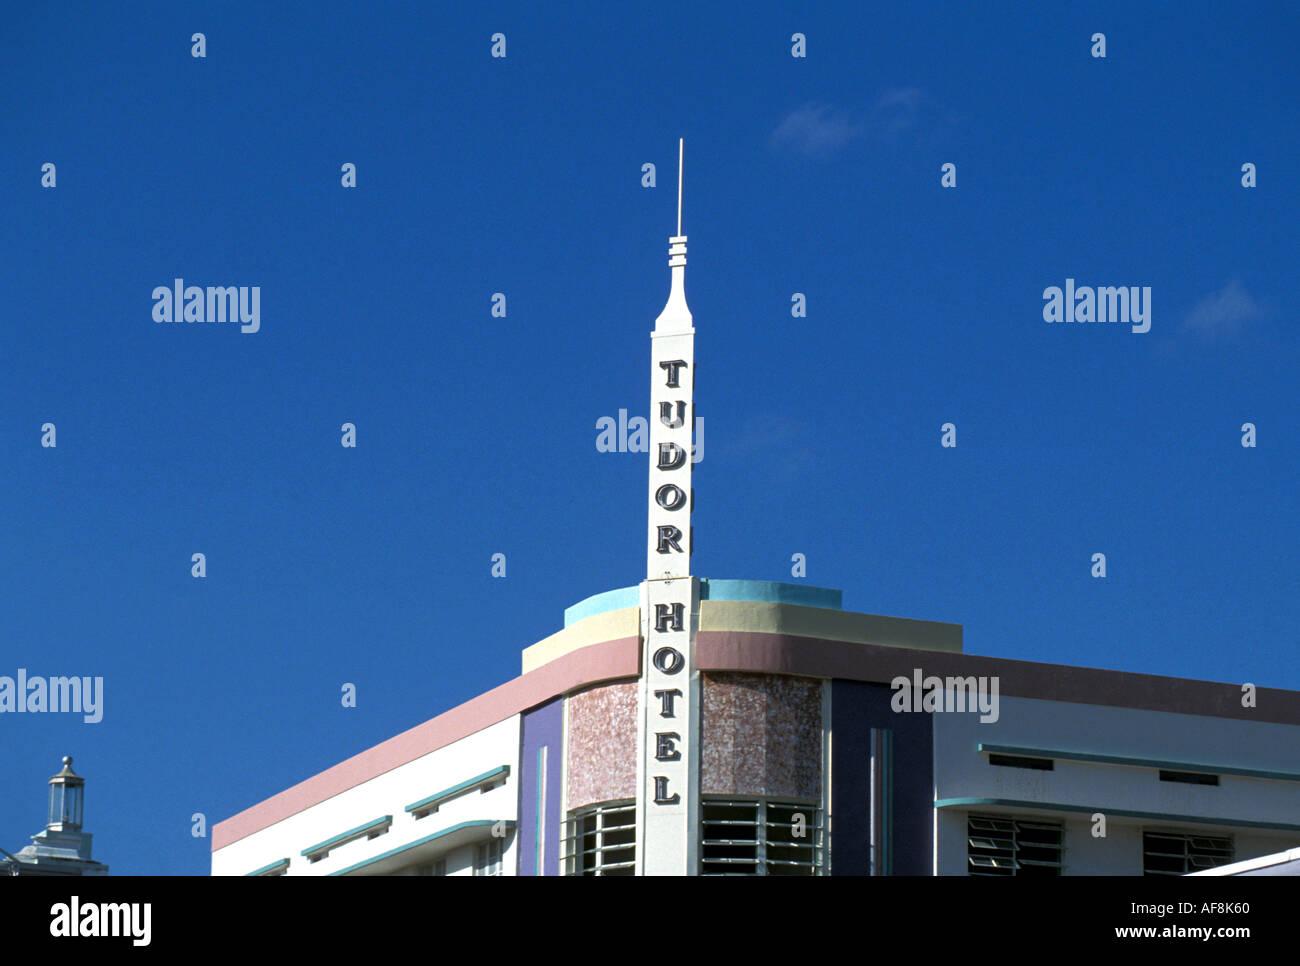 Miami South Beach Art Deco Tudor Hotel Sign Florida FL - Stock Image